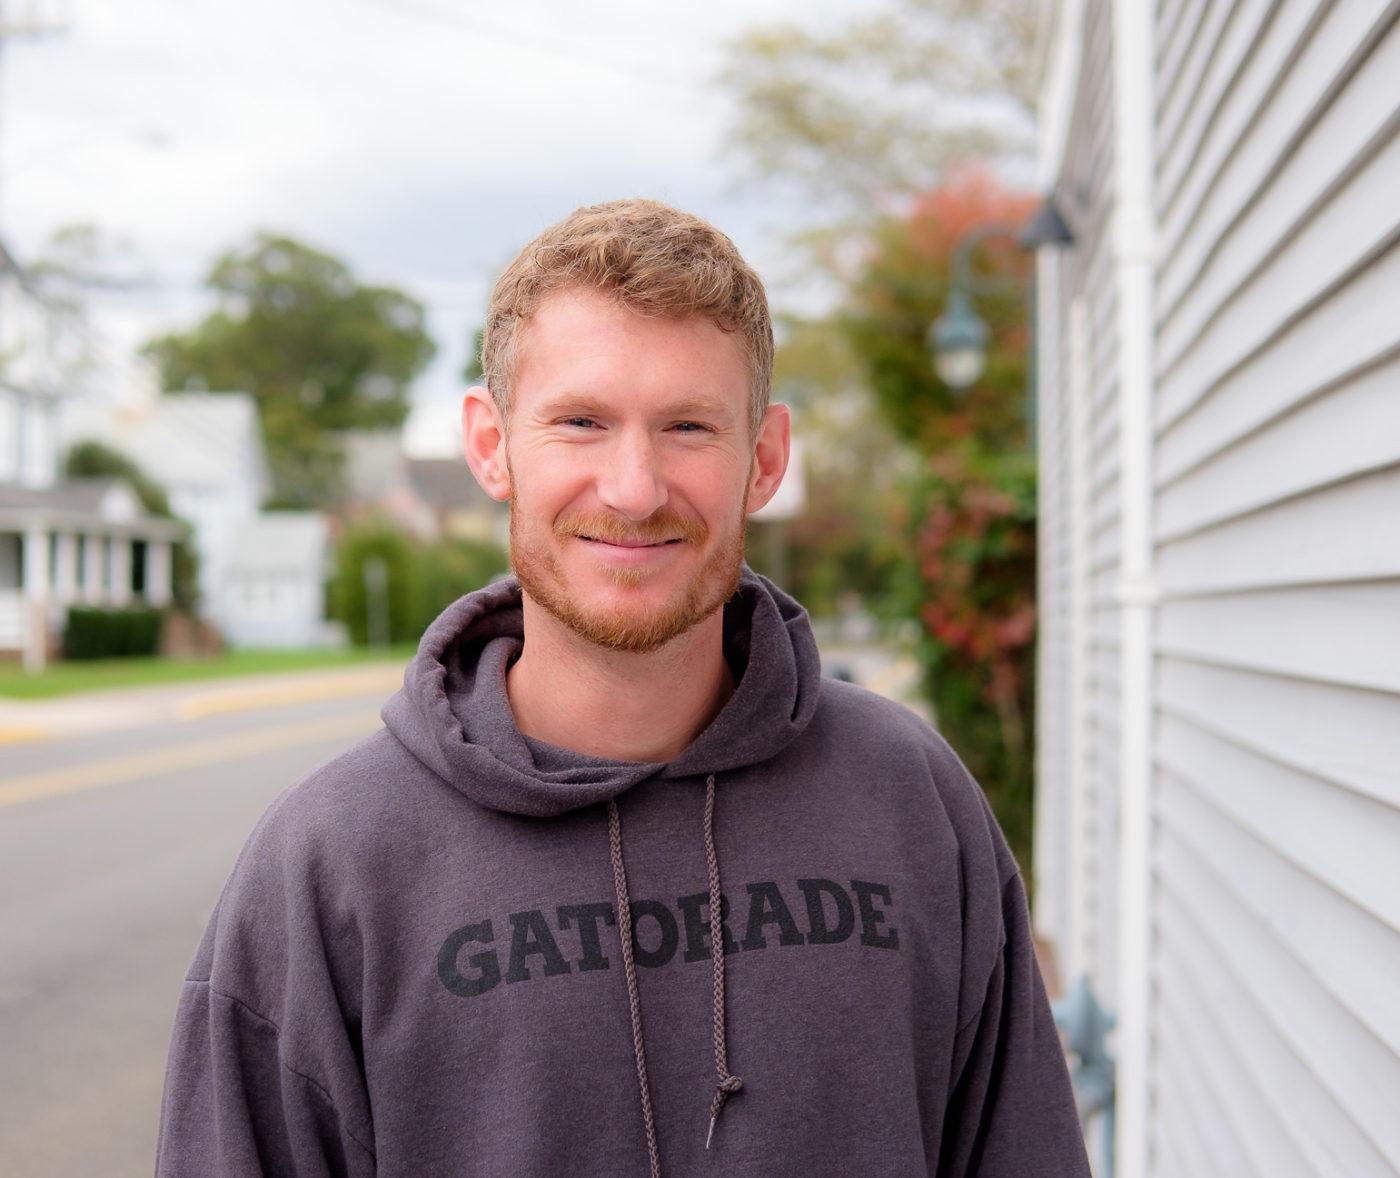 Portraits of the Jersey Shore Point Pleasant Good Samaritan Helped Car Fire Victim